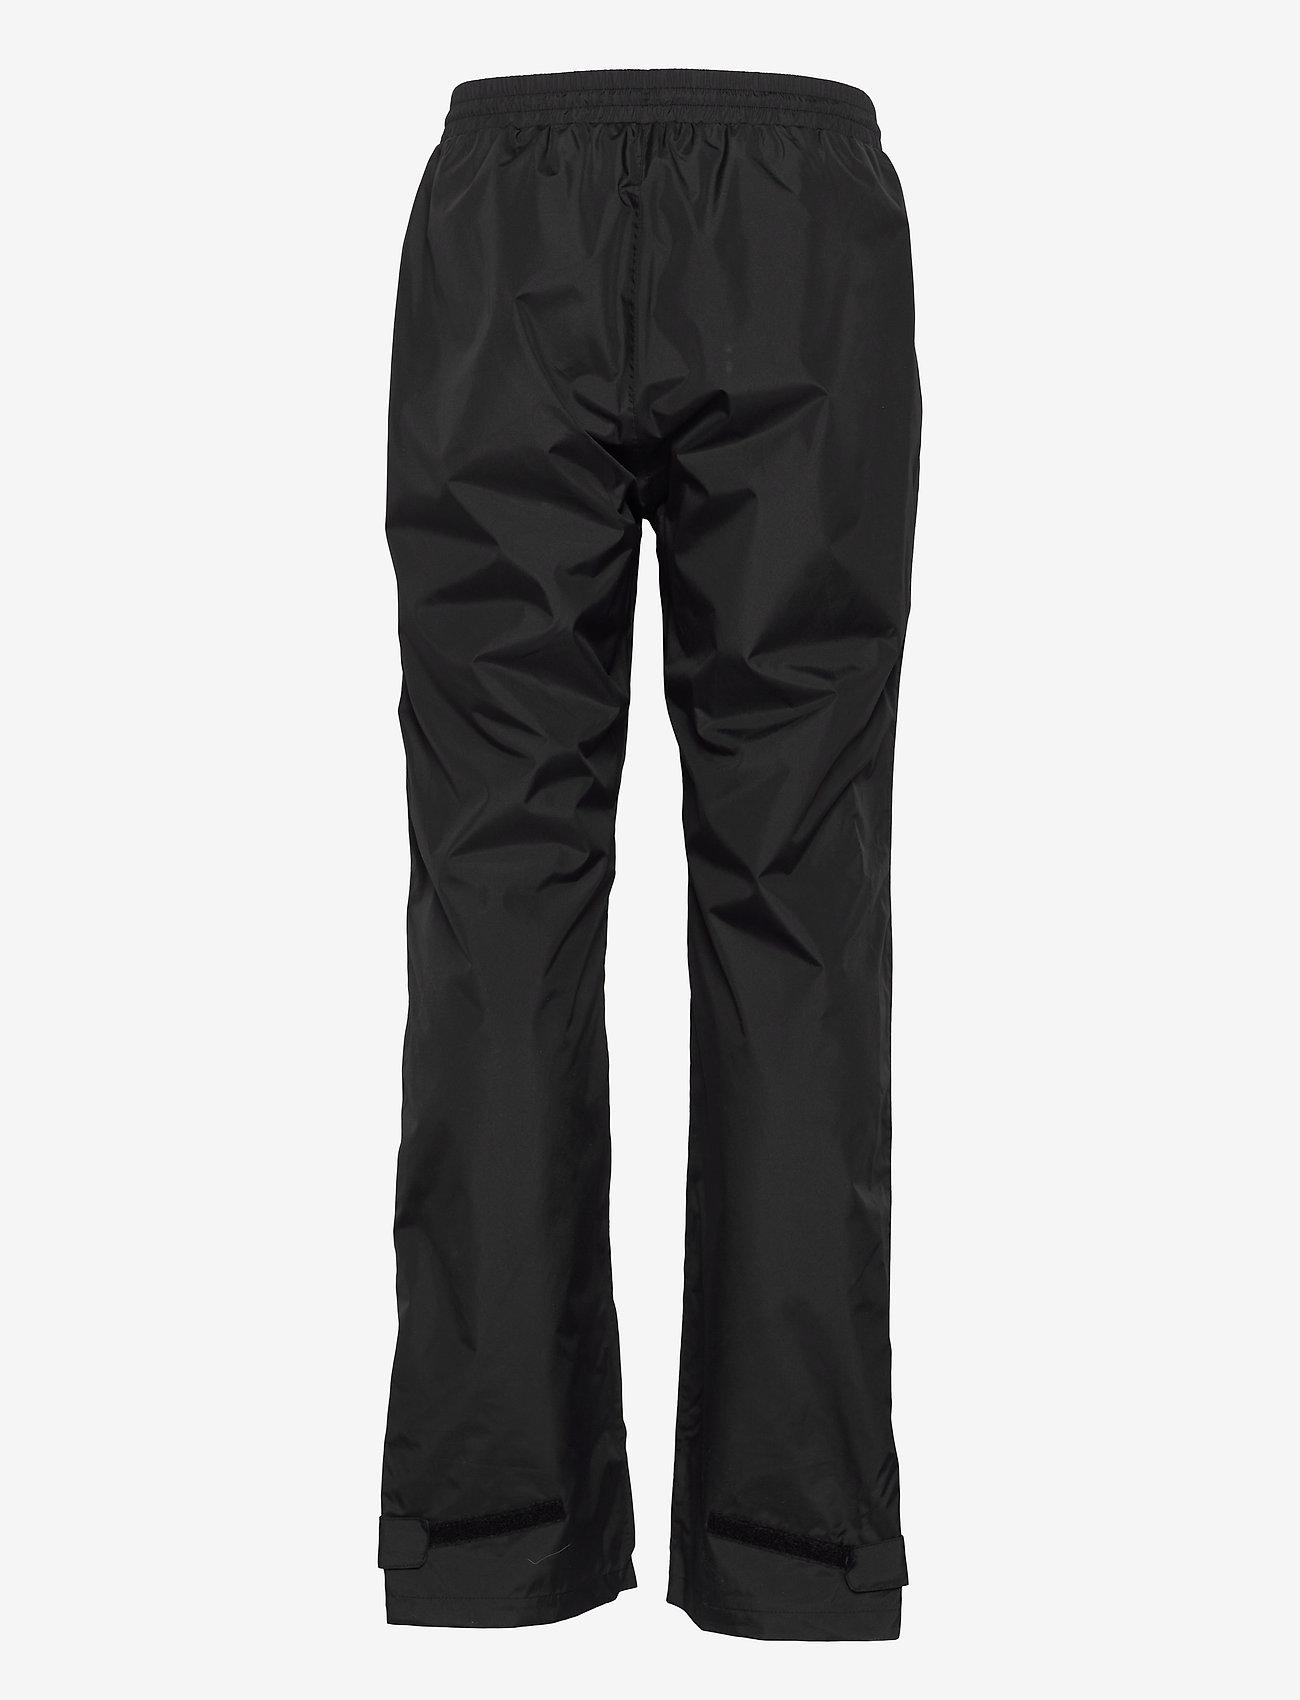 Weather Report - Jagger M AWG Rain Set W-PRO 10000 - pantalon déperlant - black - 3